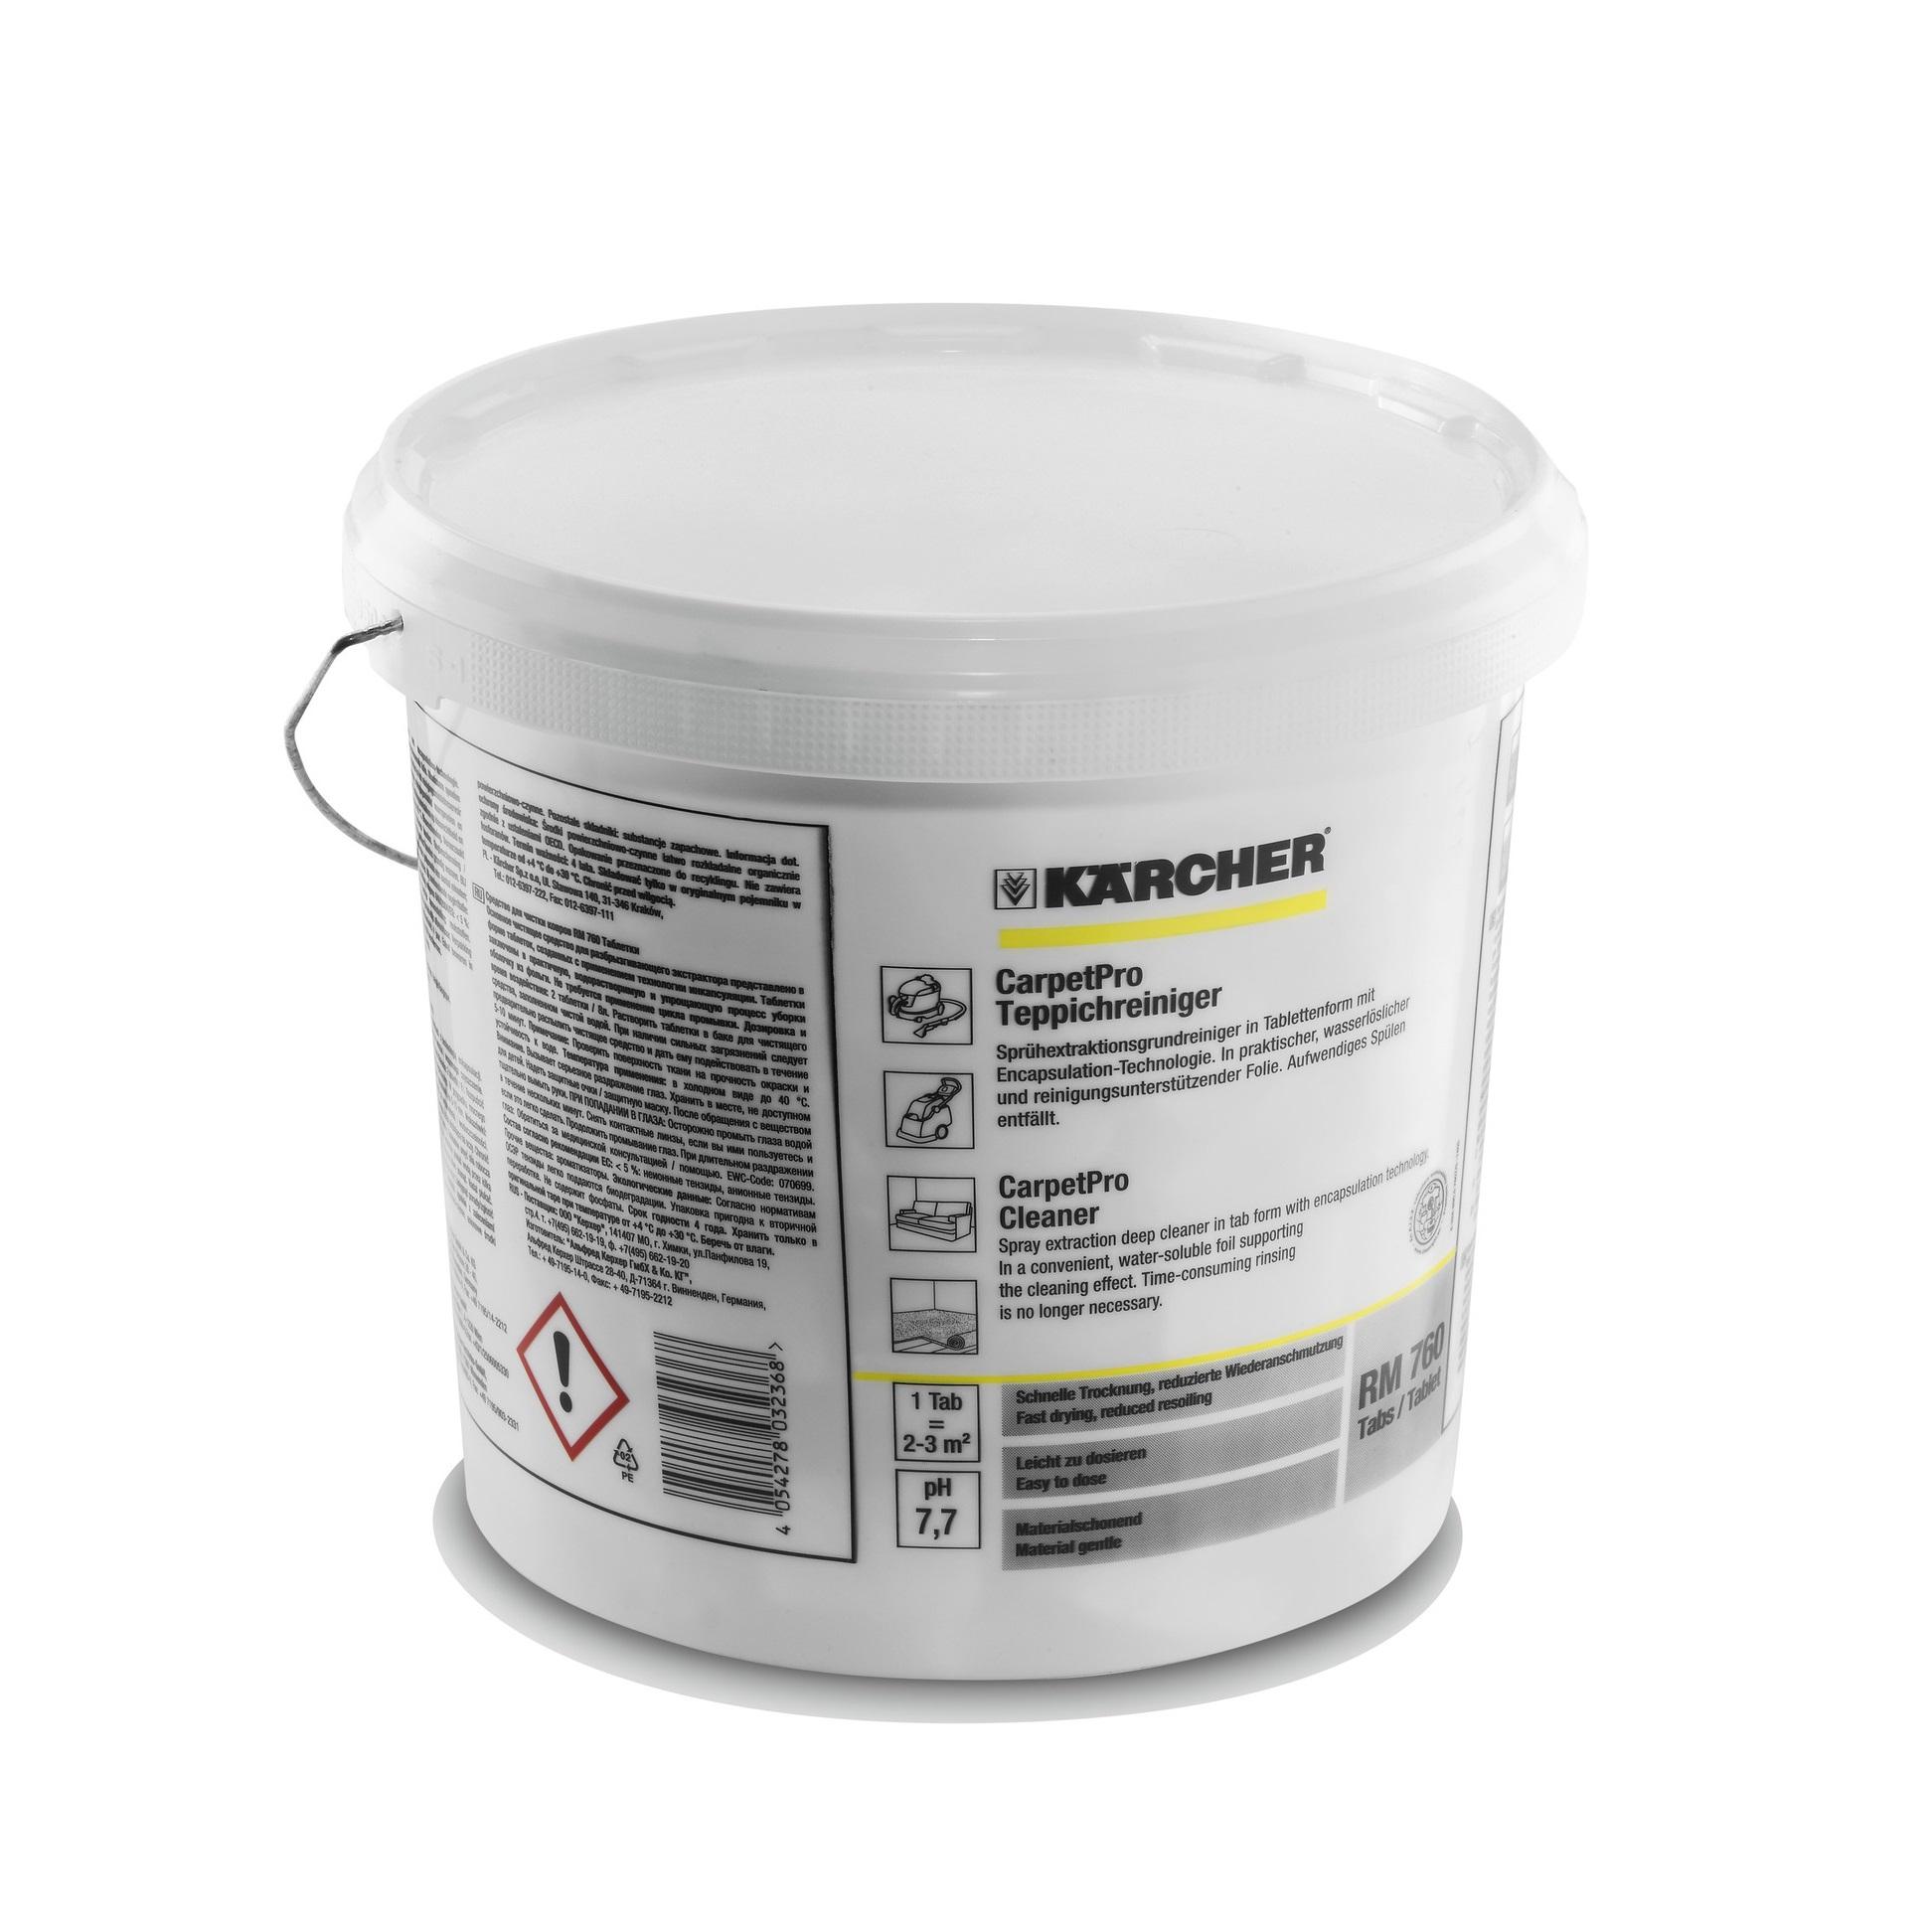 CarpetPro Средство за чистене на килими RM 760, tabletice, 200бр.